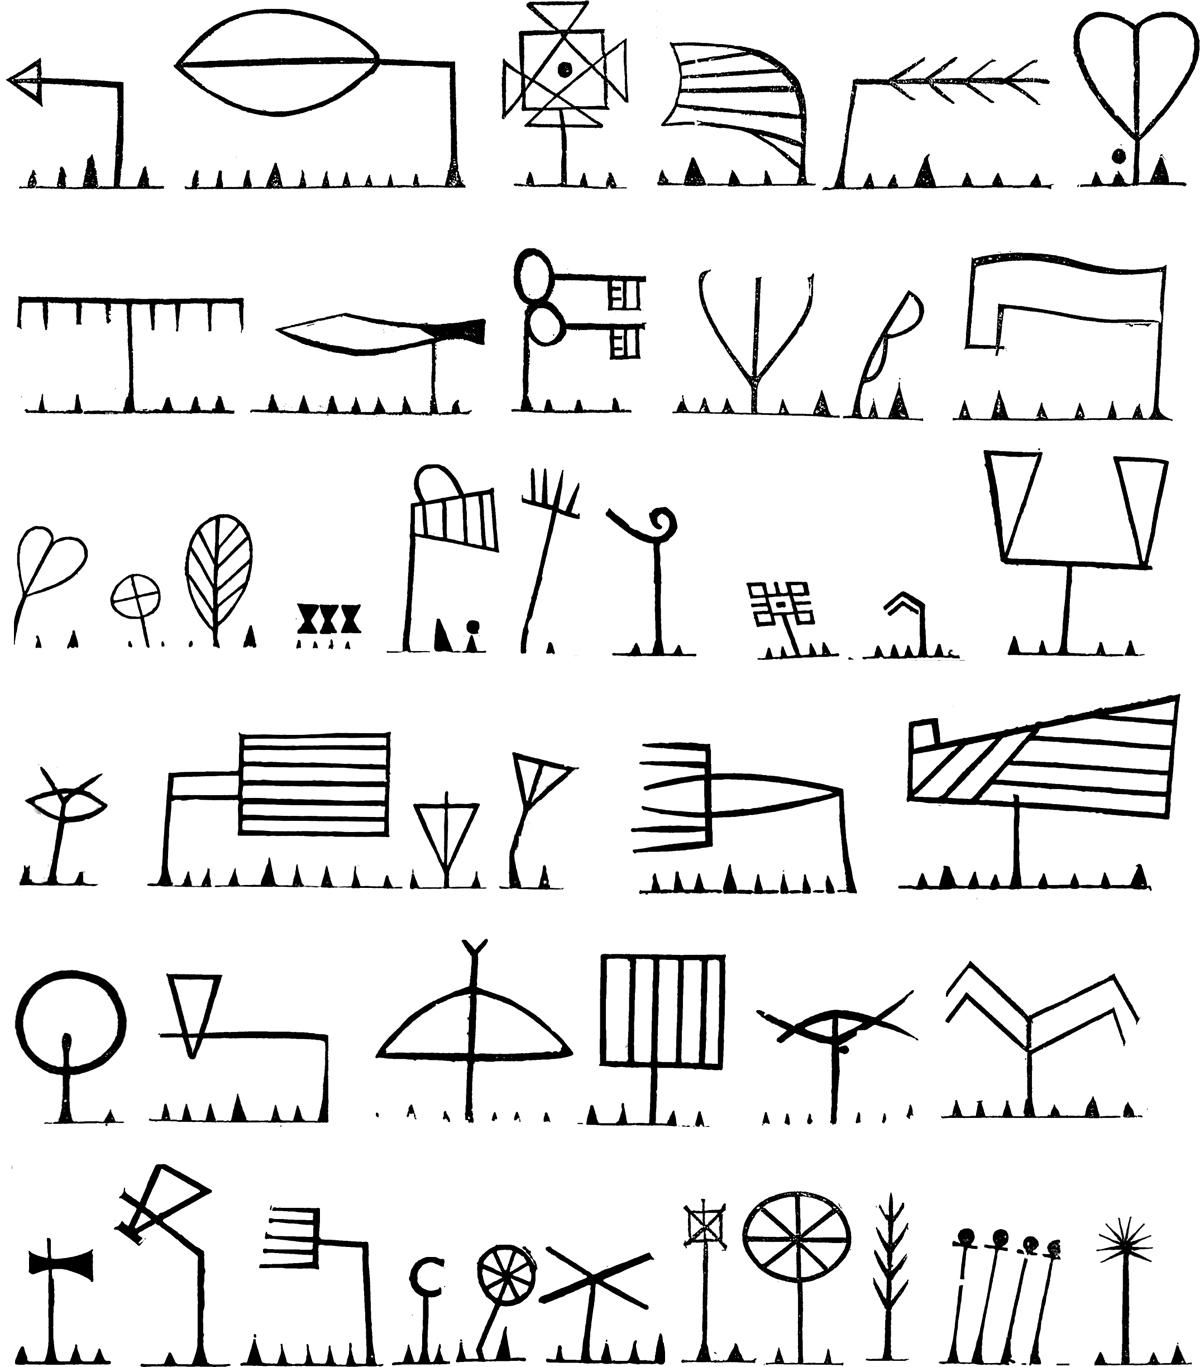 Mtg set symbols list images symbol and sign ideas all magic set symbols view symbol buycottarizona buycottarizona